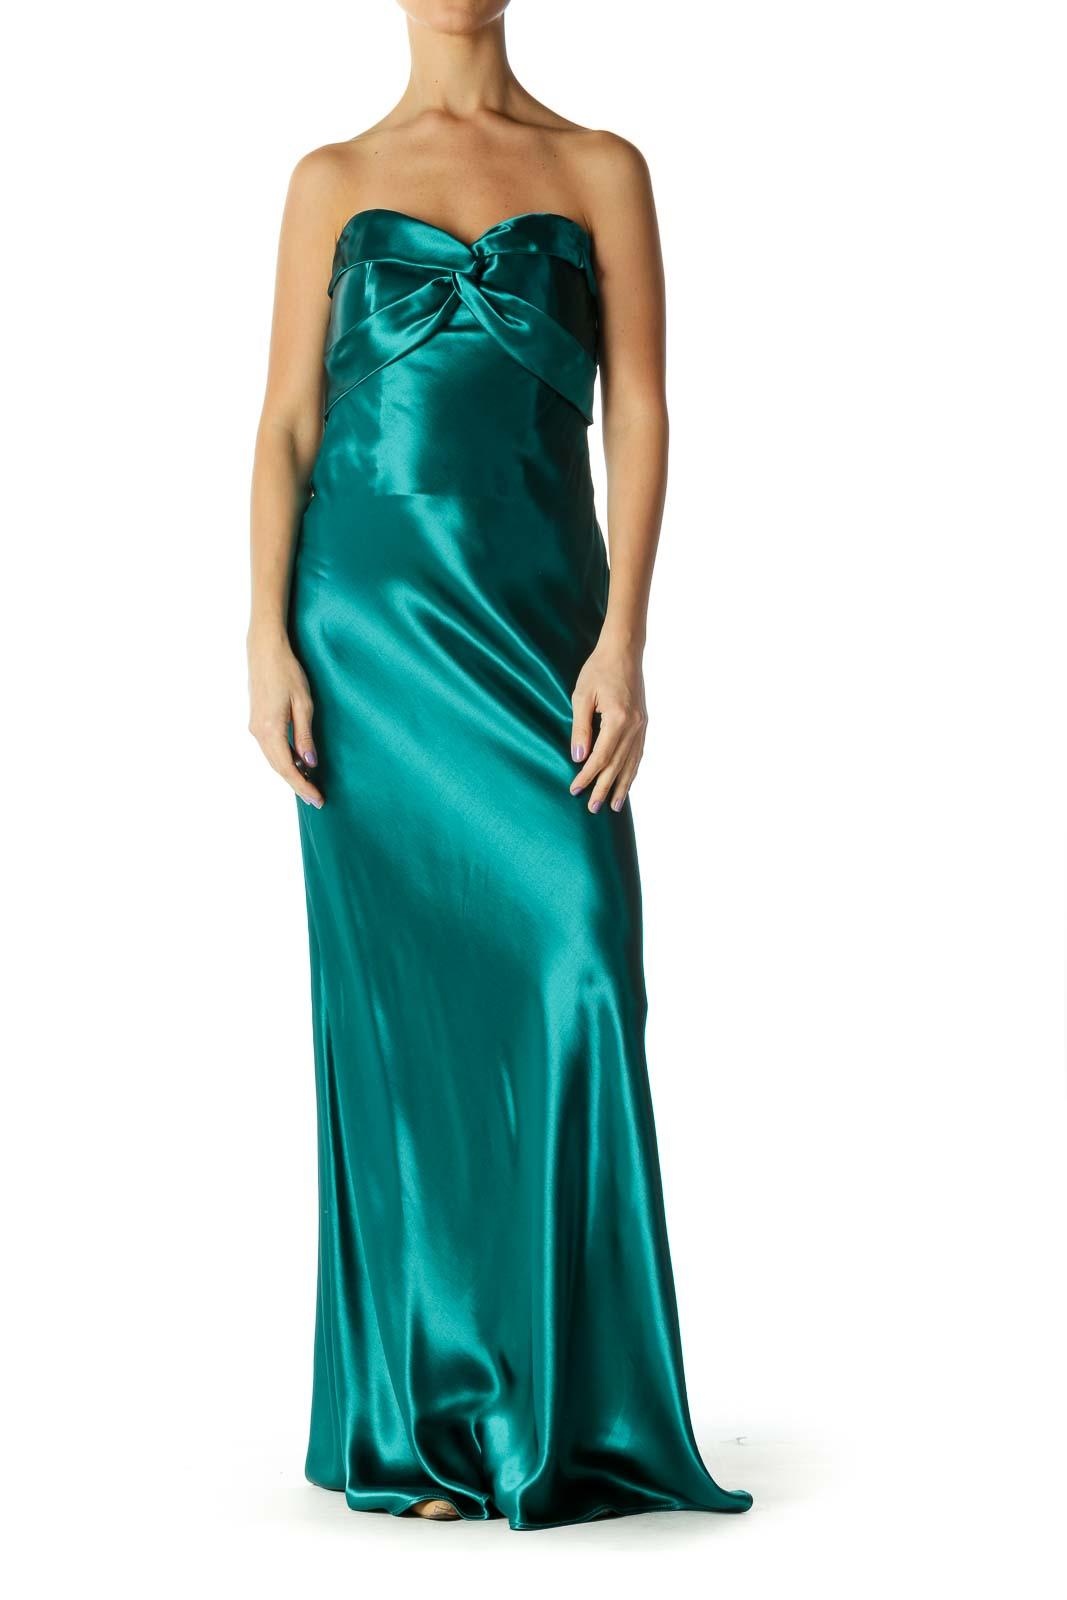 Emerald Strapless Shimmer Evening Dress Front